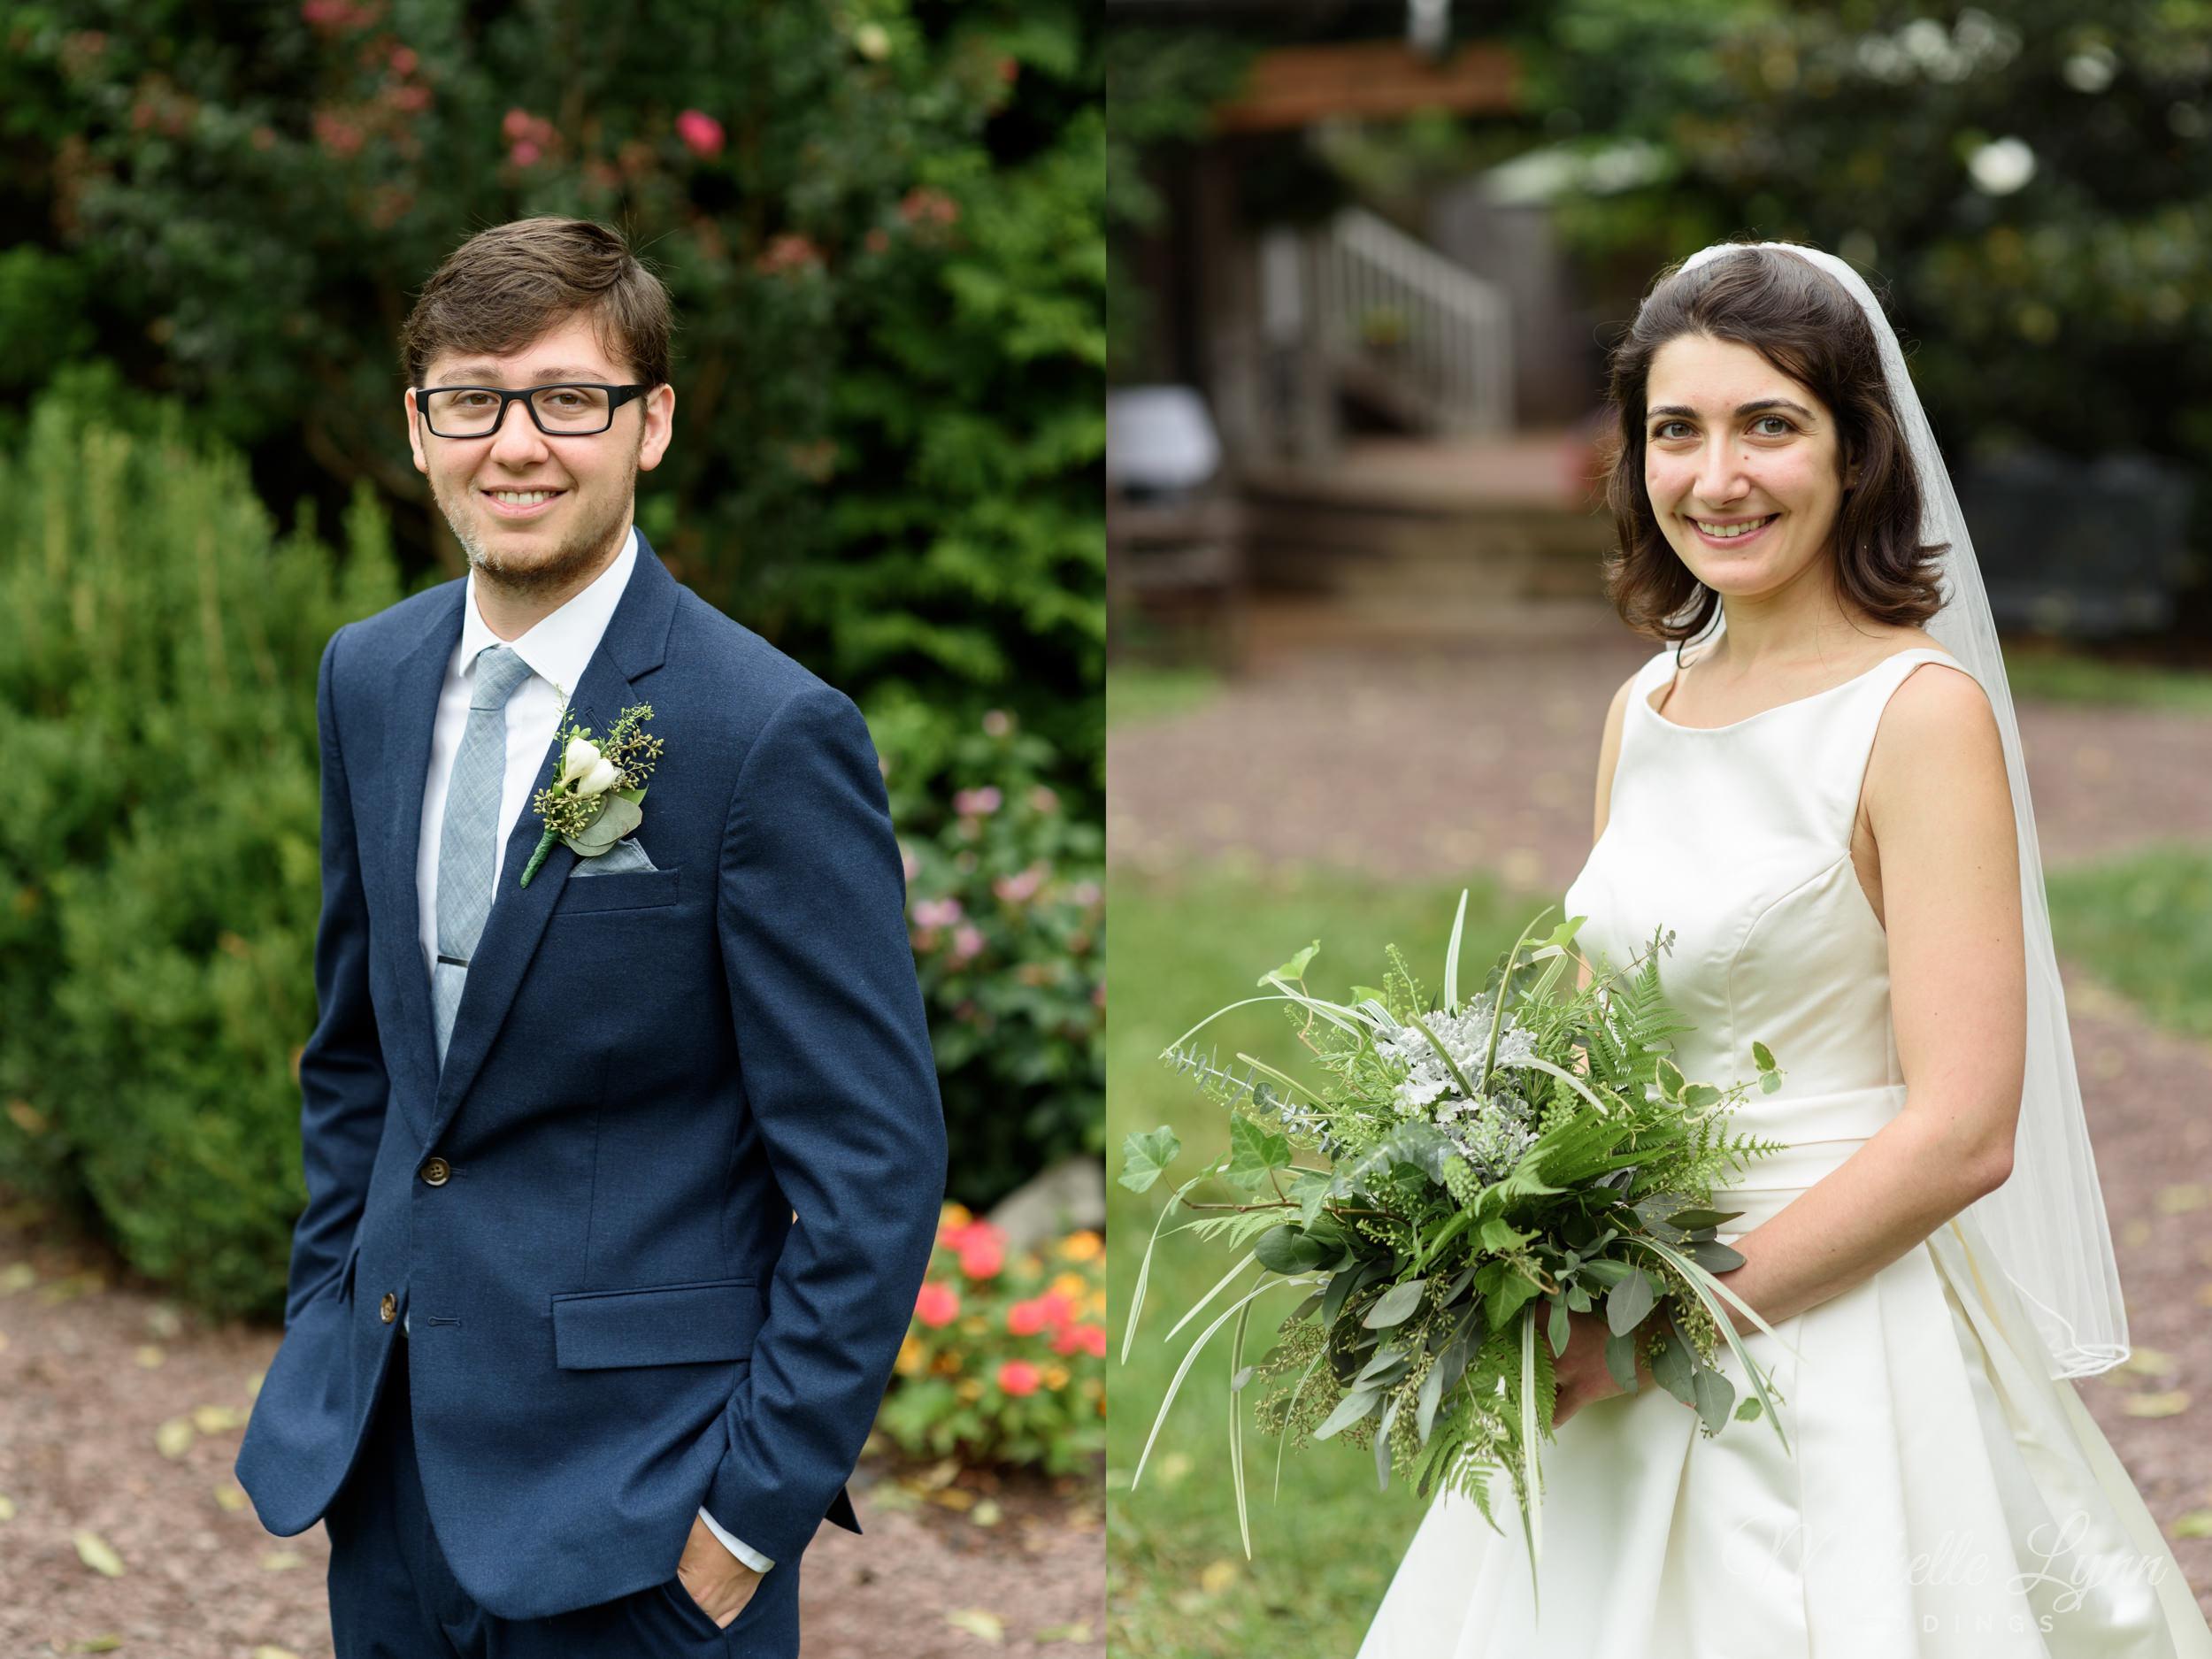 mlw-general-warren-malvern-wedding-photographer-26.jpg